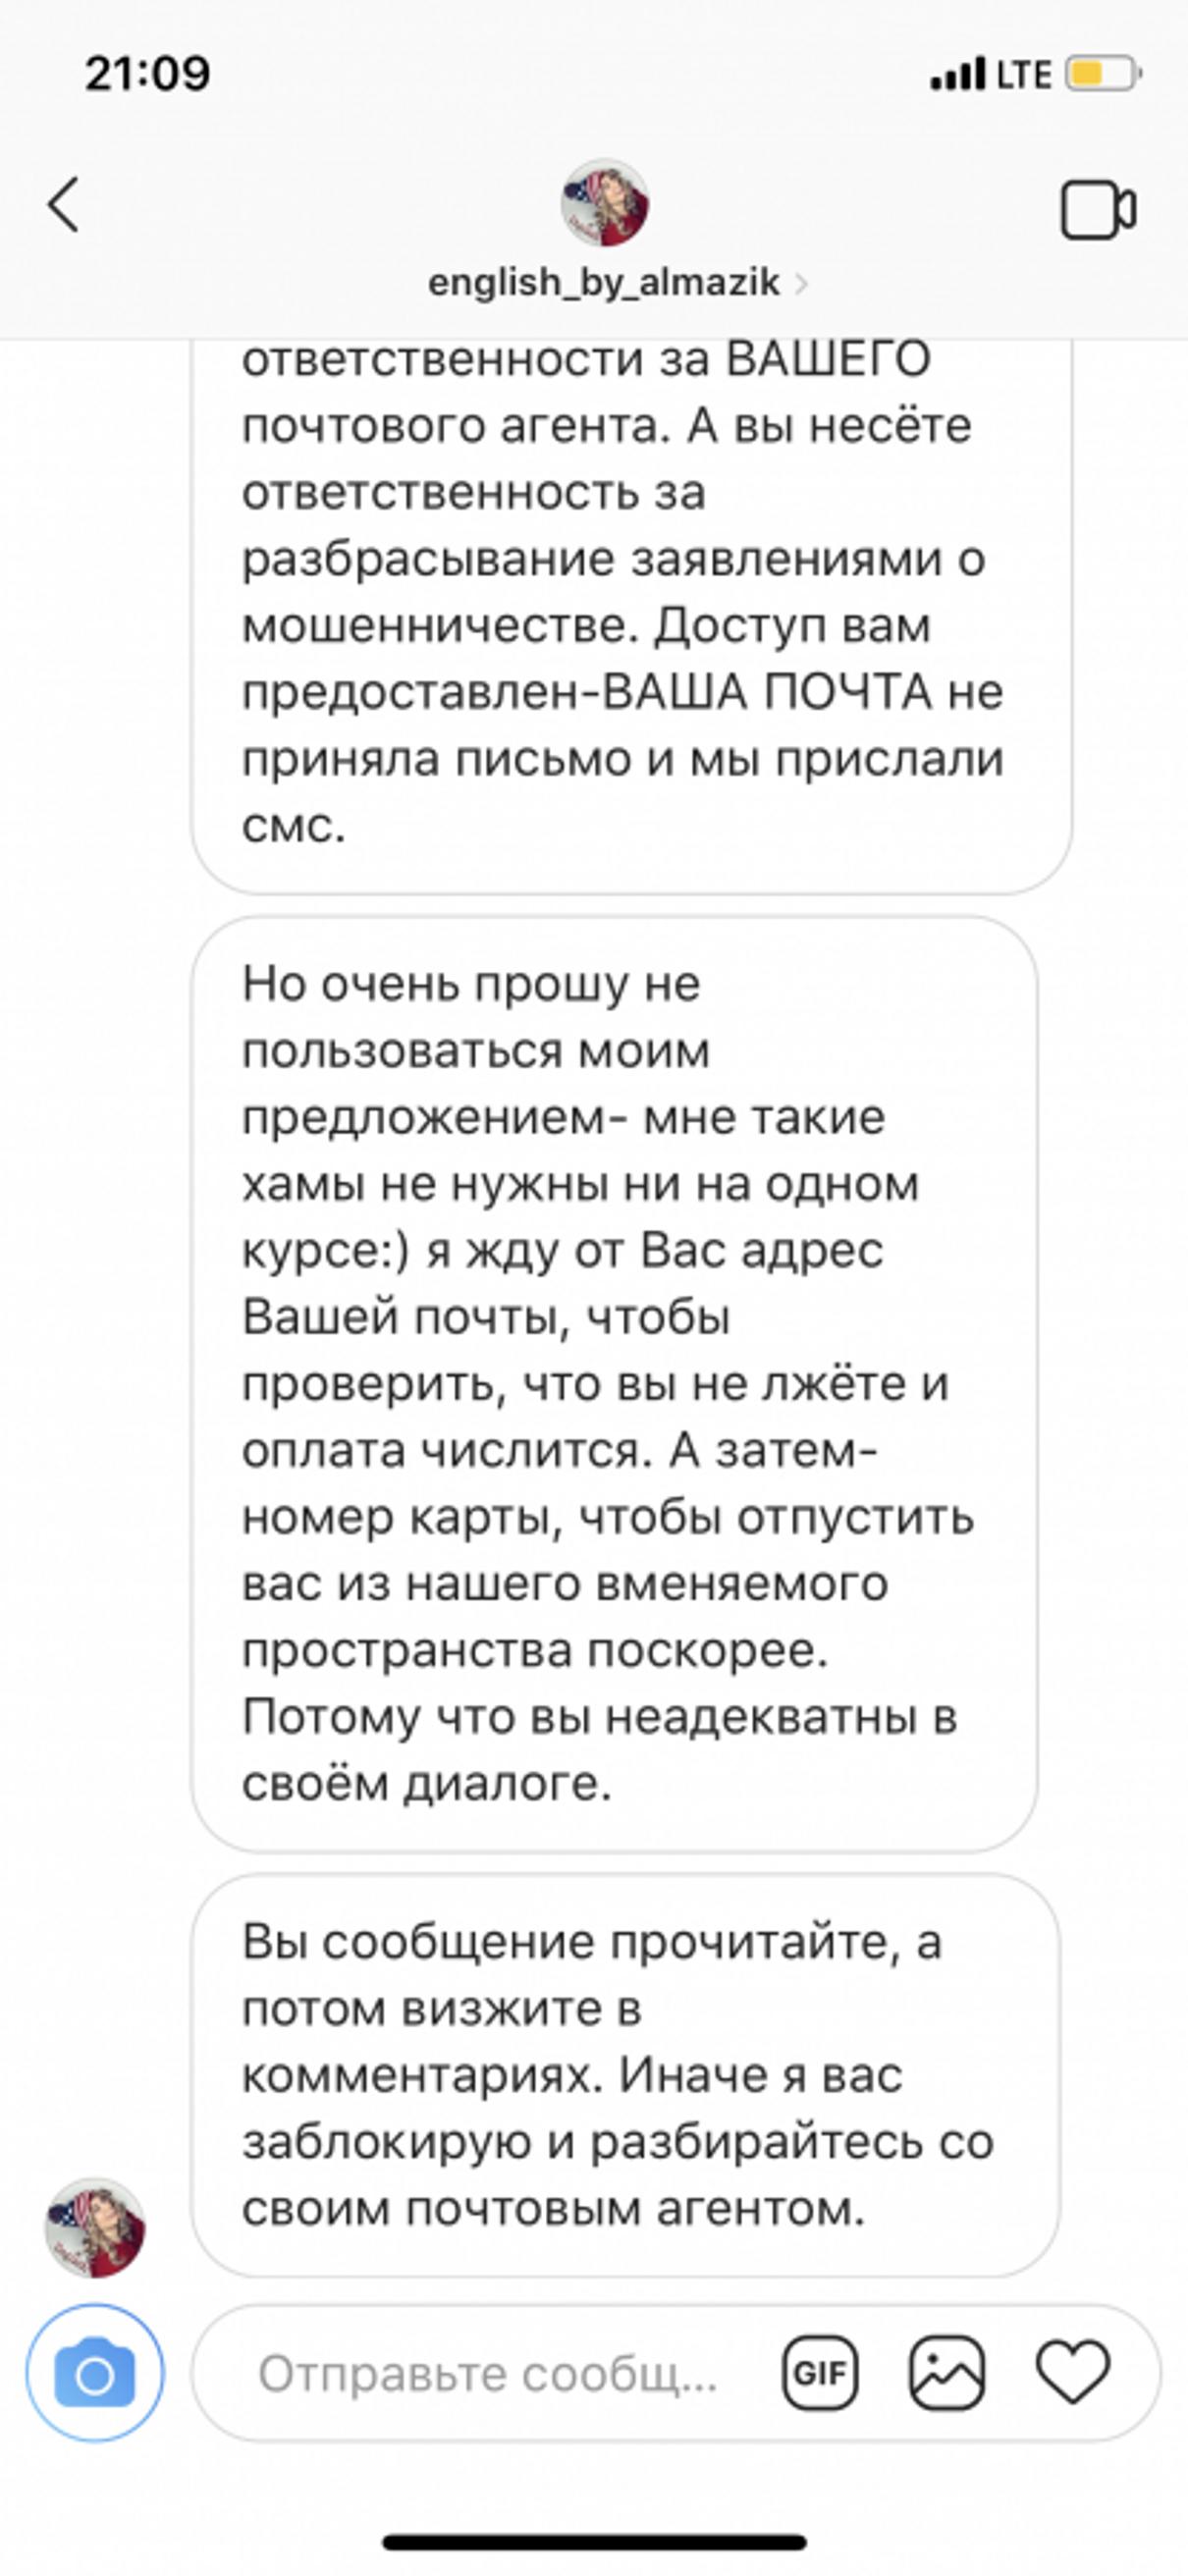 Жалоба-отзыв: English_by_almazik - МОШЕННИЦА!!!!.  Фото №3